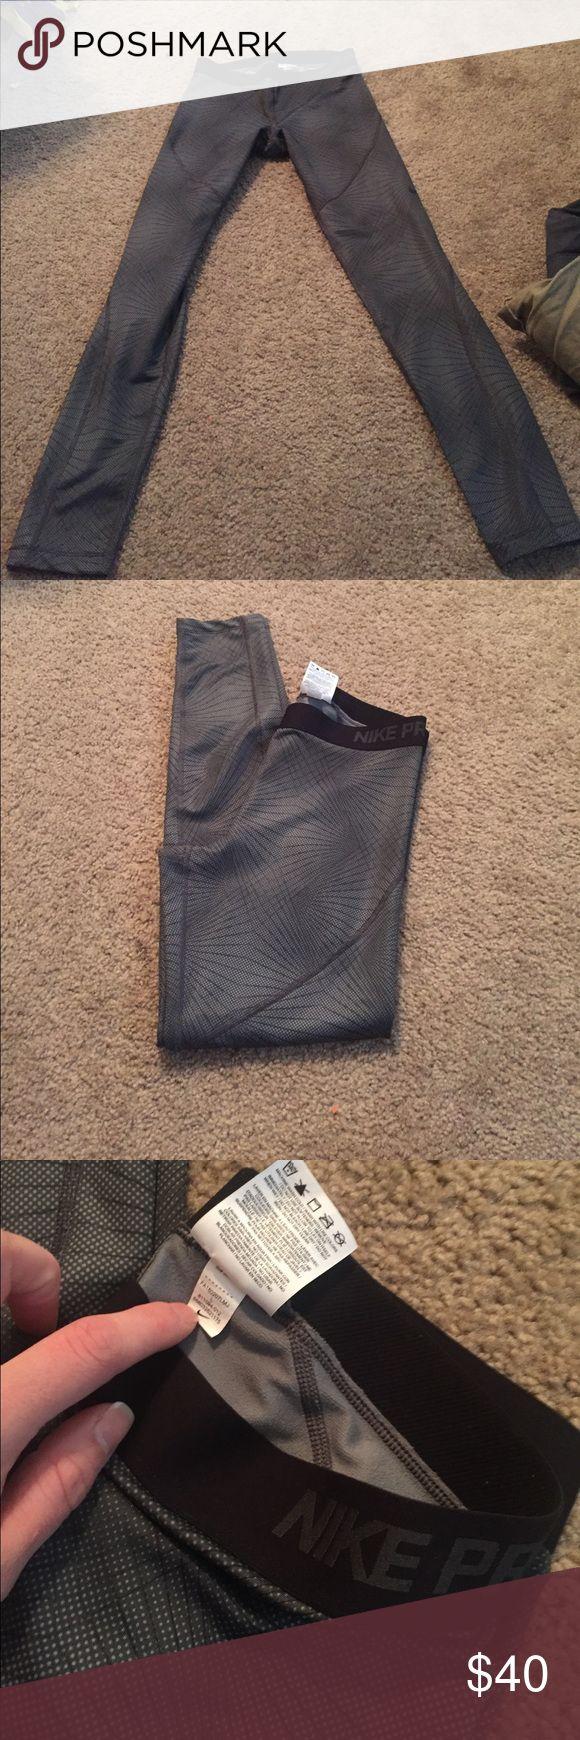 Nike pro women's leggings Worn once! Excellent condition Nike pro hyper warm leggings! Nike Pants Leggings